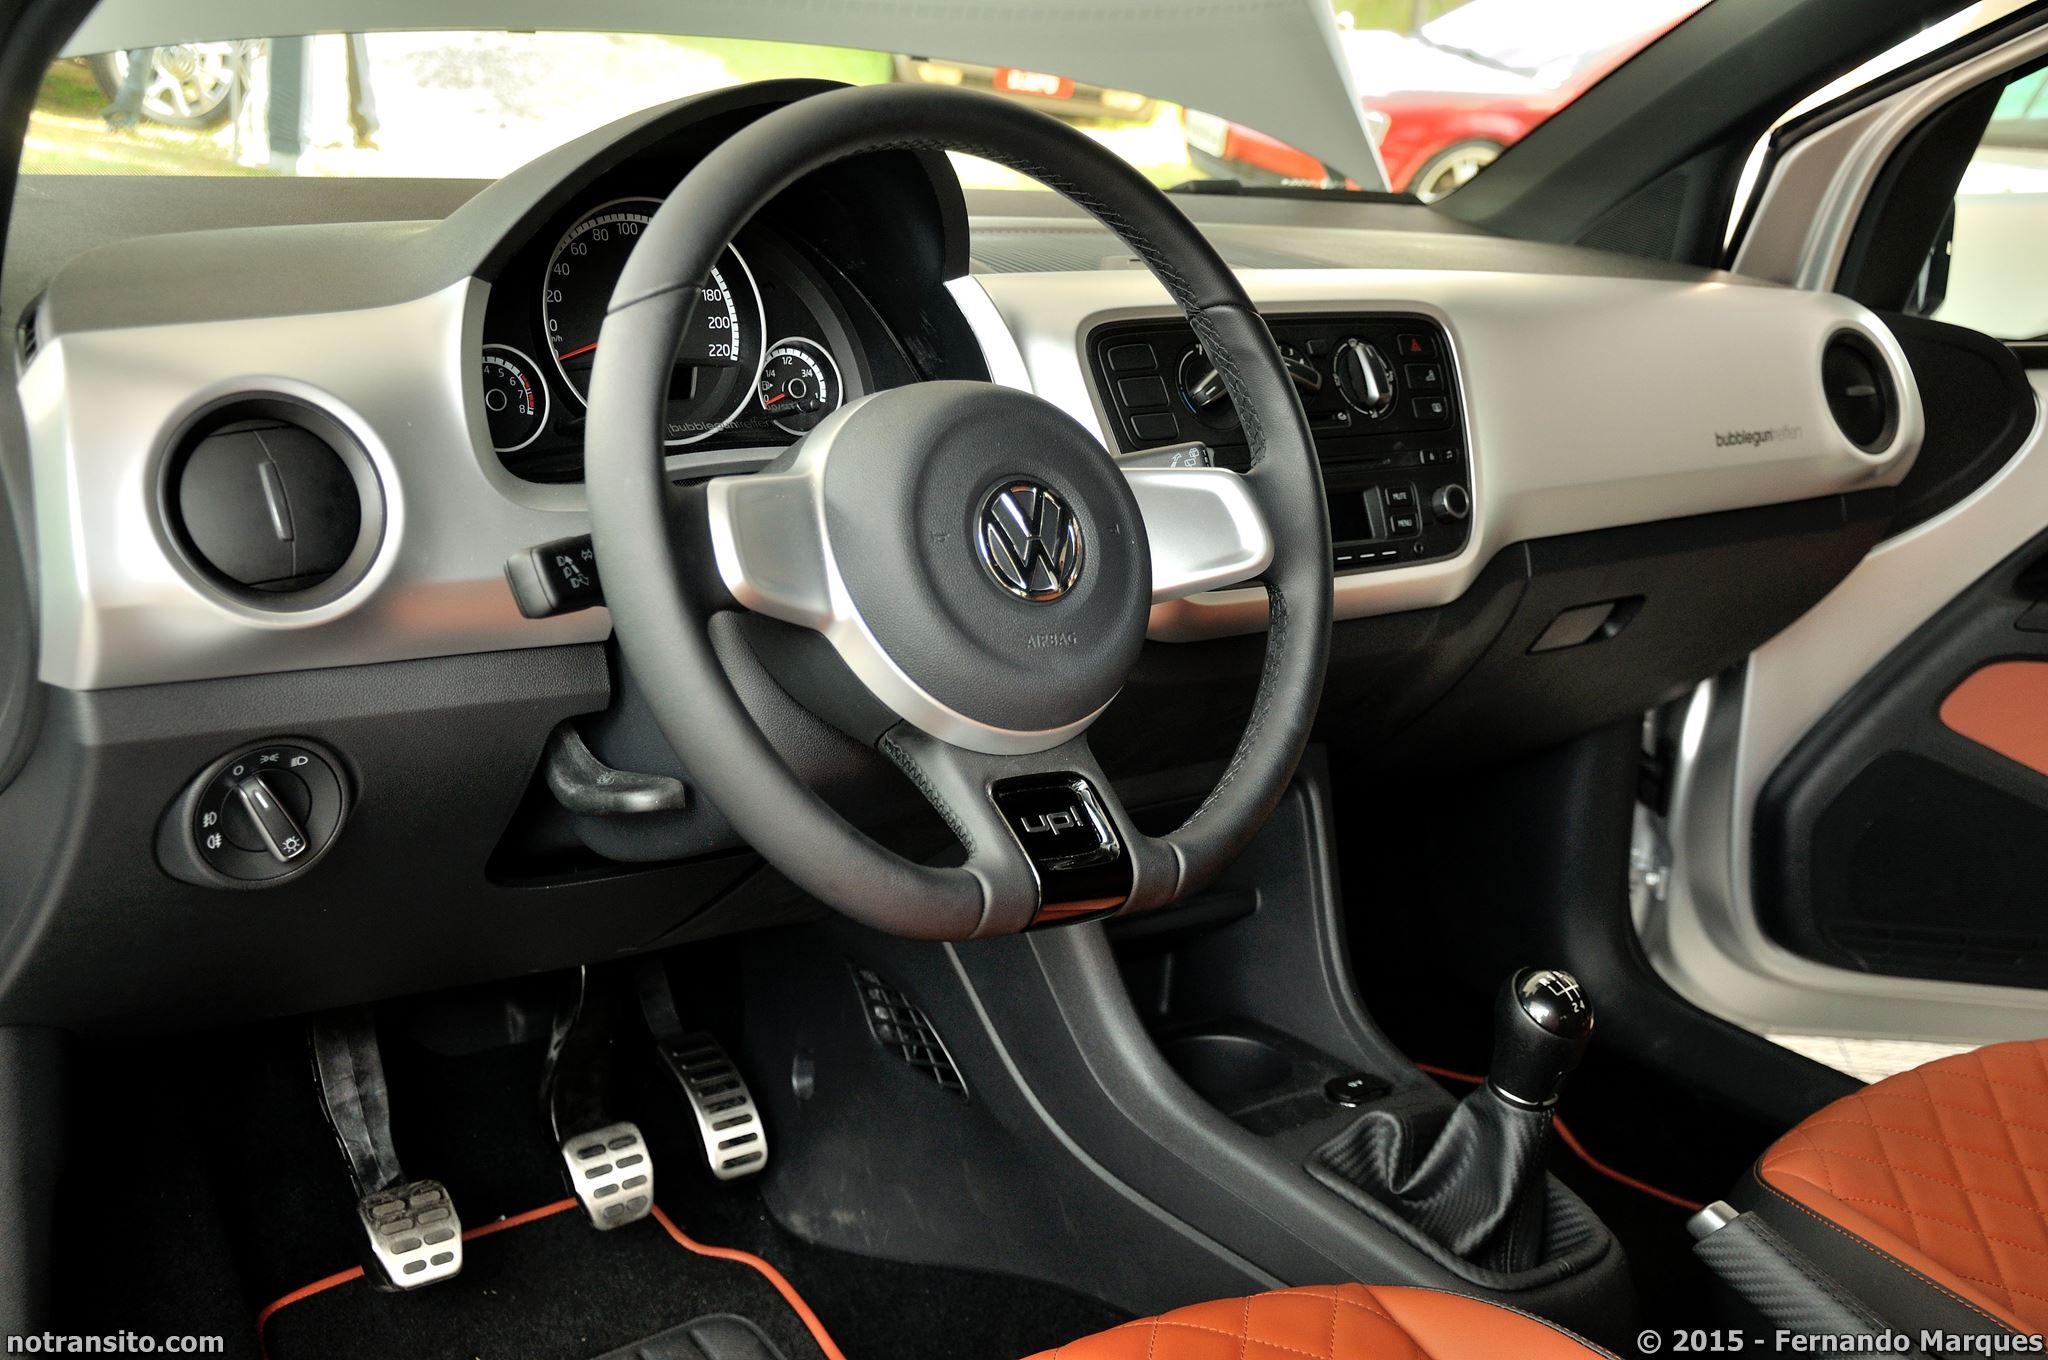 Volkswagen Up! TSI Bubble Gun Treffen, BGT 7, Bubble Gun Treffen 7, BGT 2015, Bubble Gun Treffen 2015, Bubble Gun Treffen